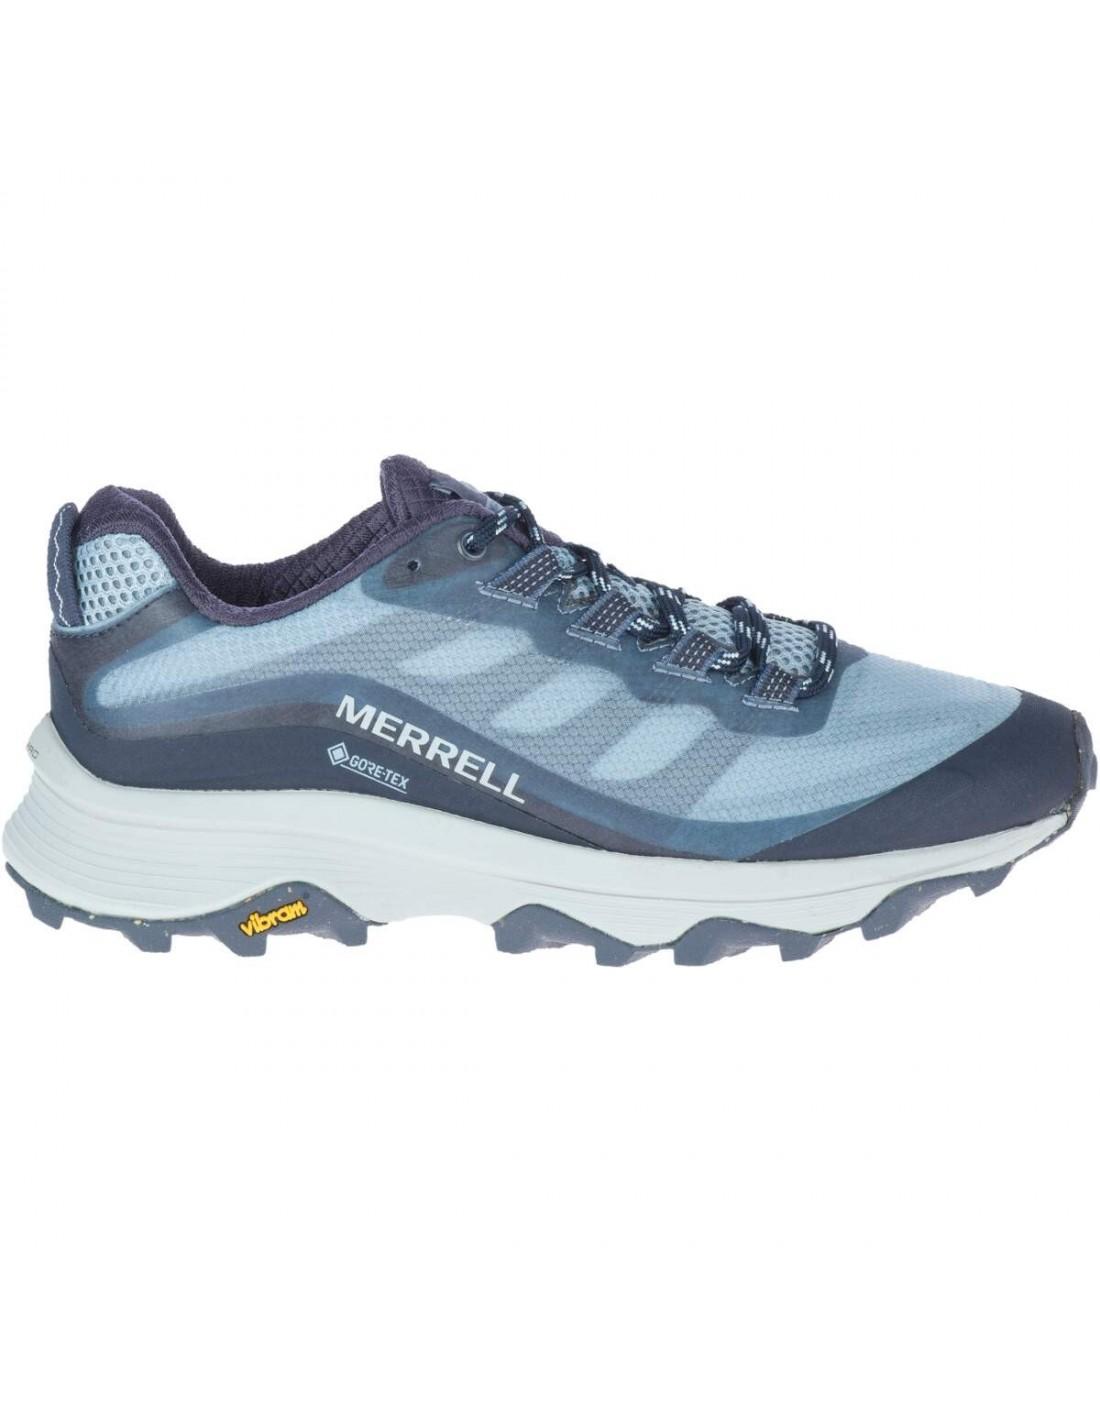 Hikingsko Dame Merrell Moab Speed GTX Dame J066856 1,275.00